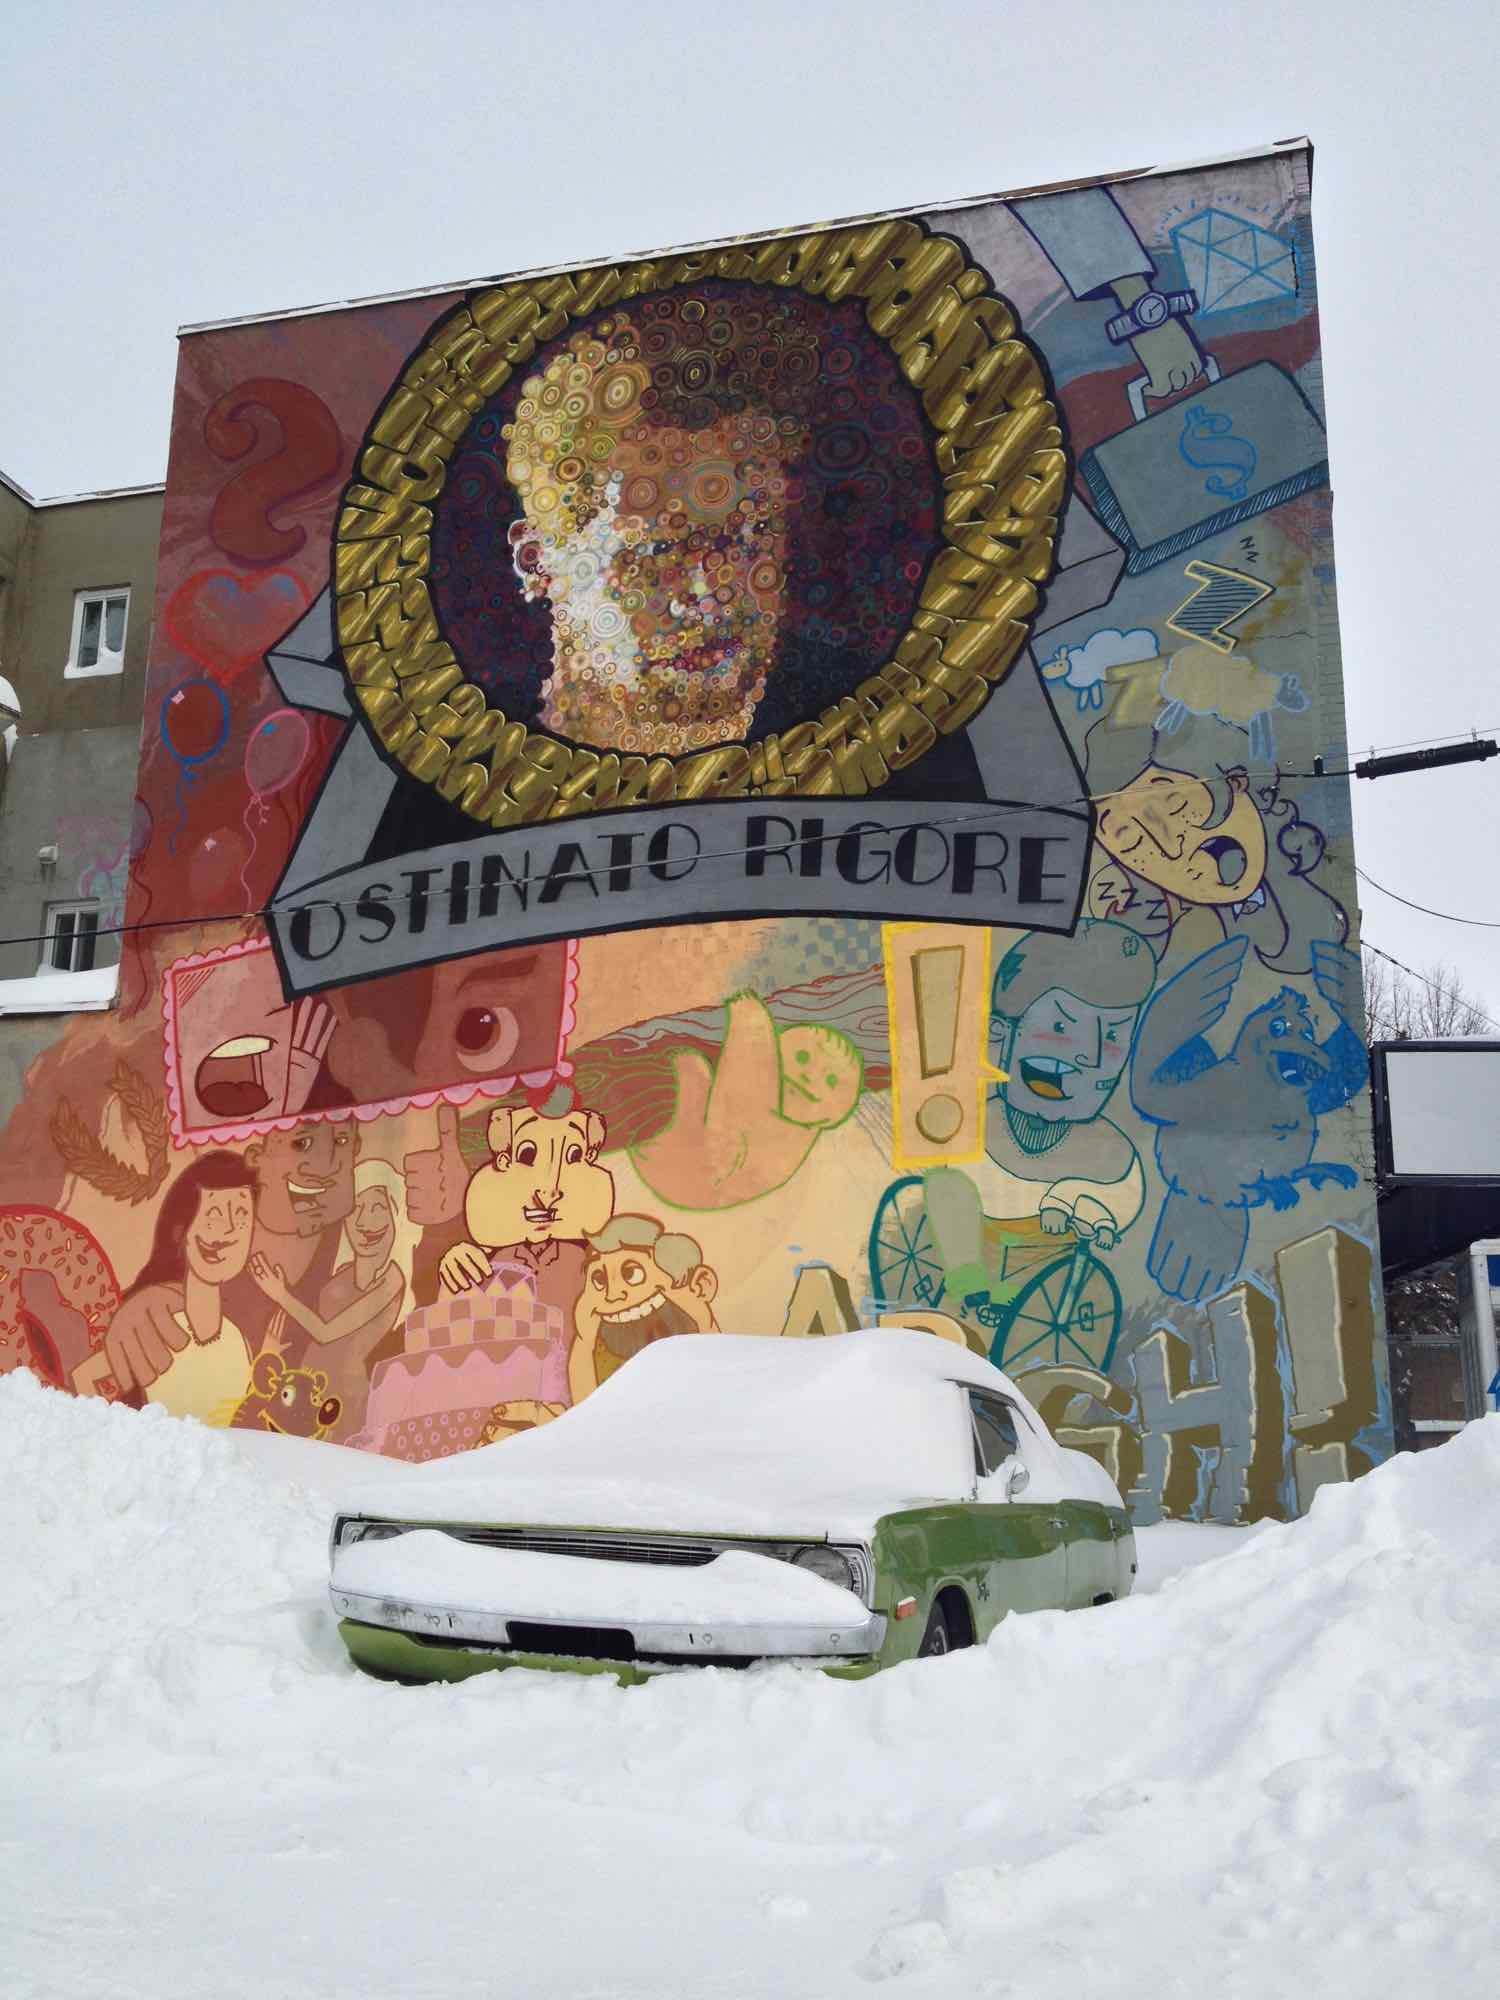 The_Walls_Of_Montreal-Ezra_Soiferman - 32.jpg